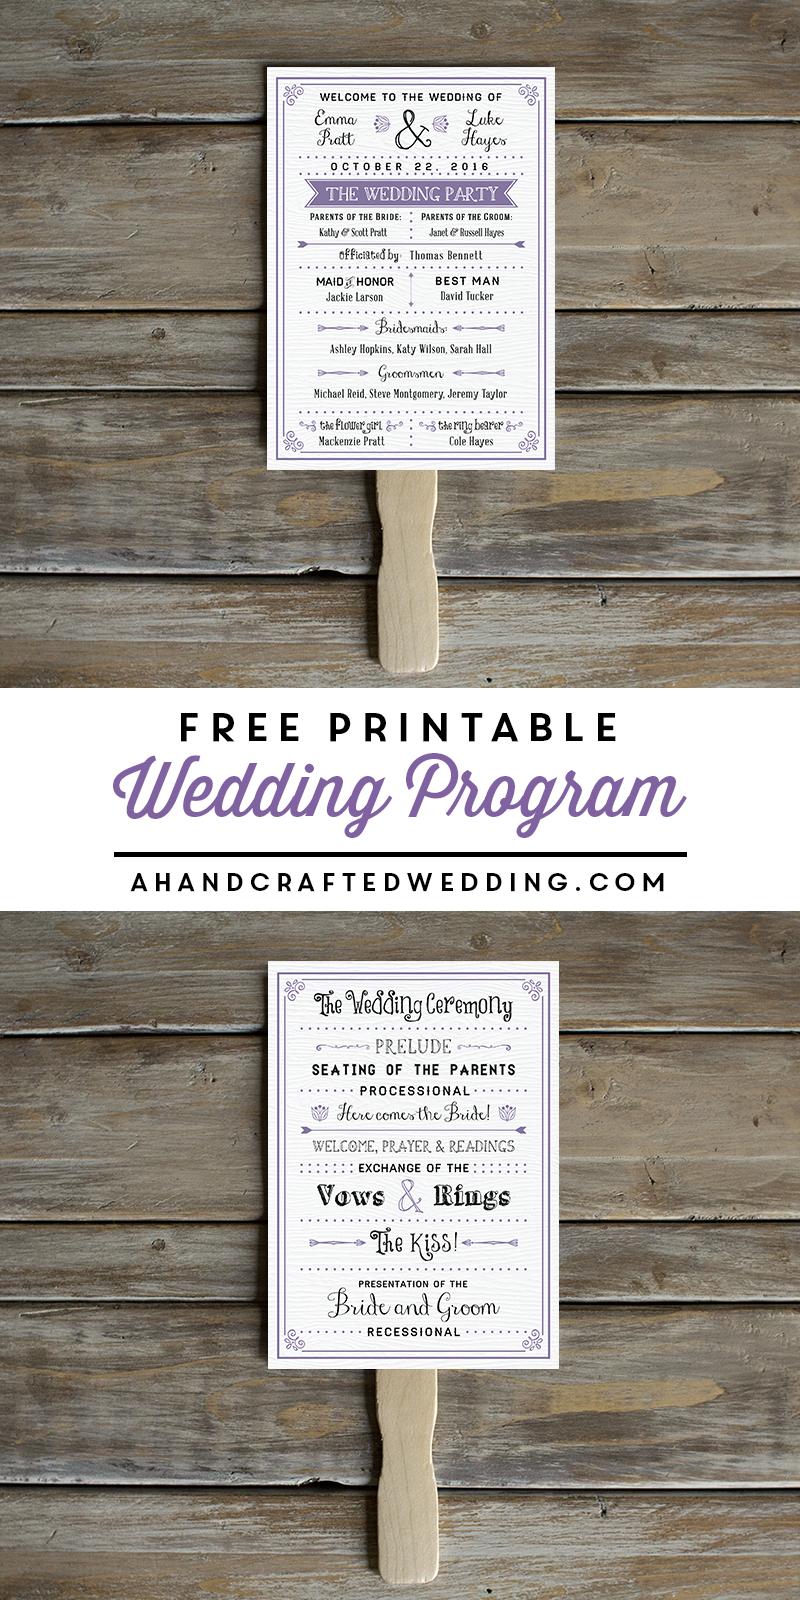 Free Printable Wedding Program   Crafty 2 The Core~Diy Galore - Free Printable Fan Wedding Programs